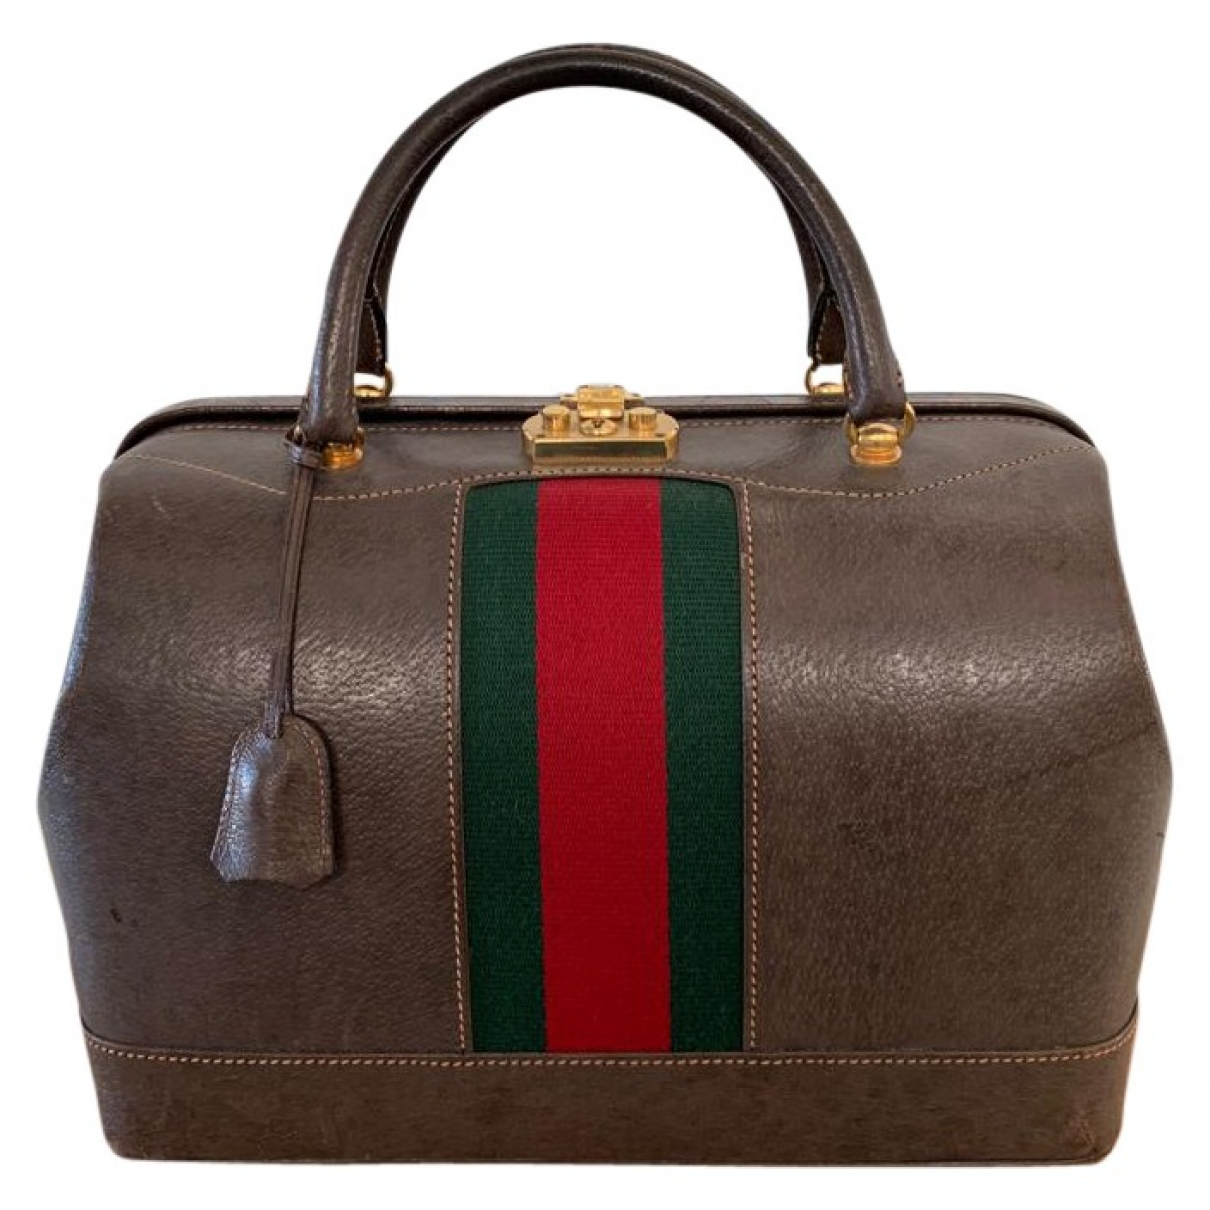 Gucci \N Khaki Leather Travel bag for Women \N